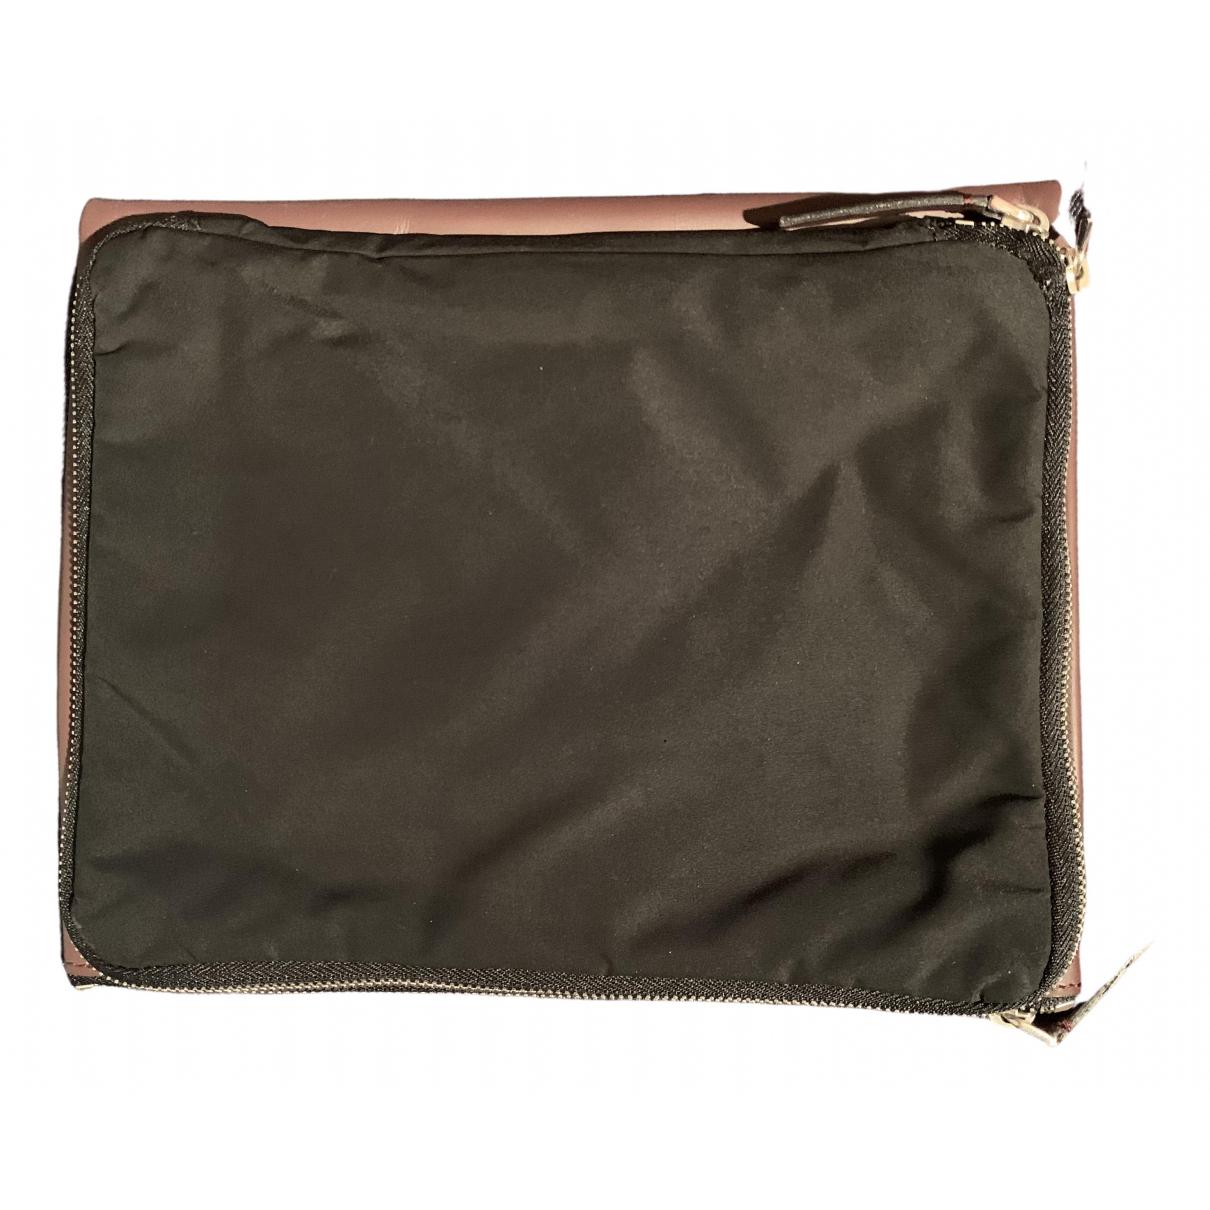 Marni \N Brown Leather Clutch bag for Women \N